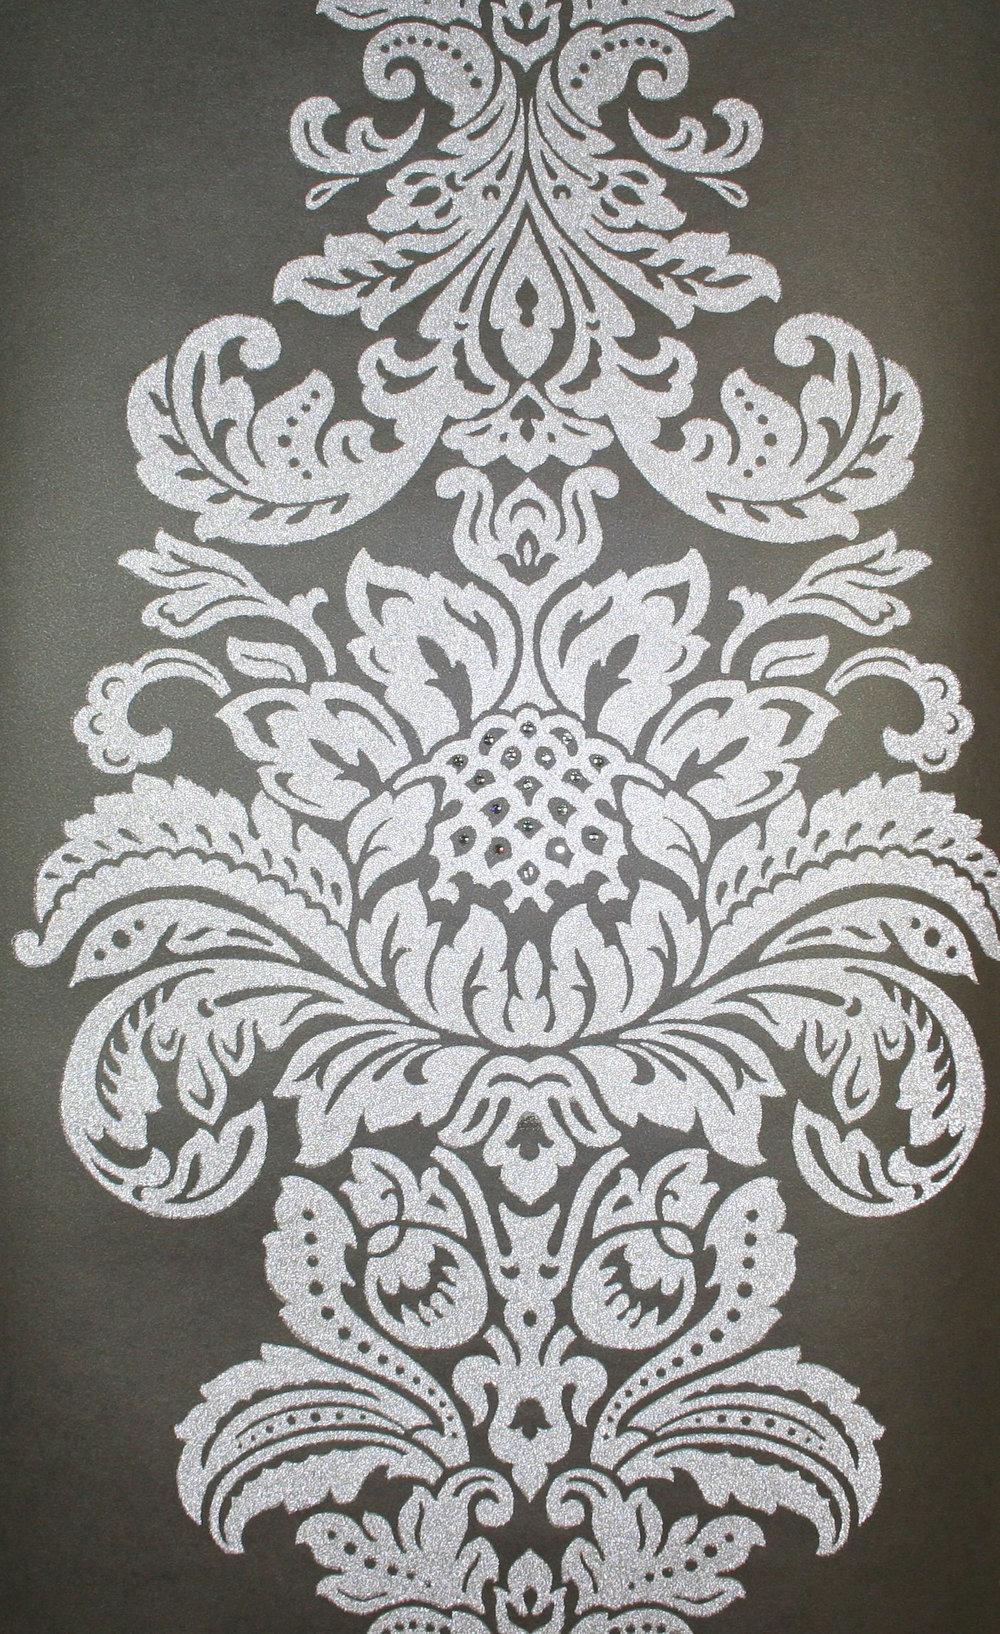 Beaded wallpaper